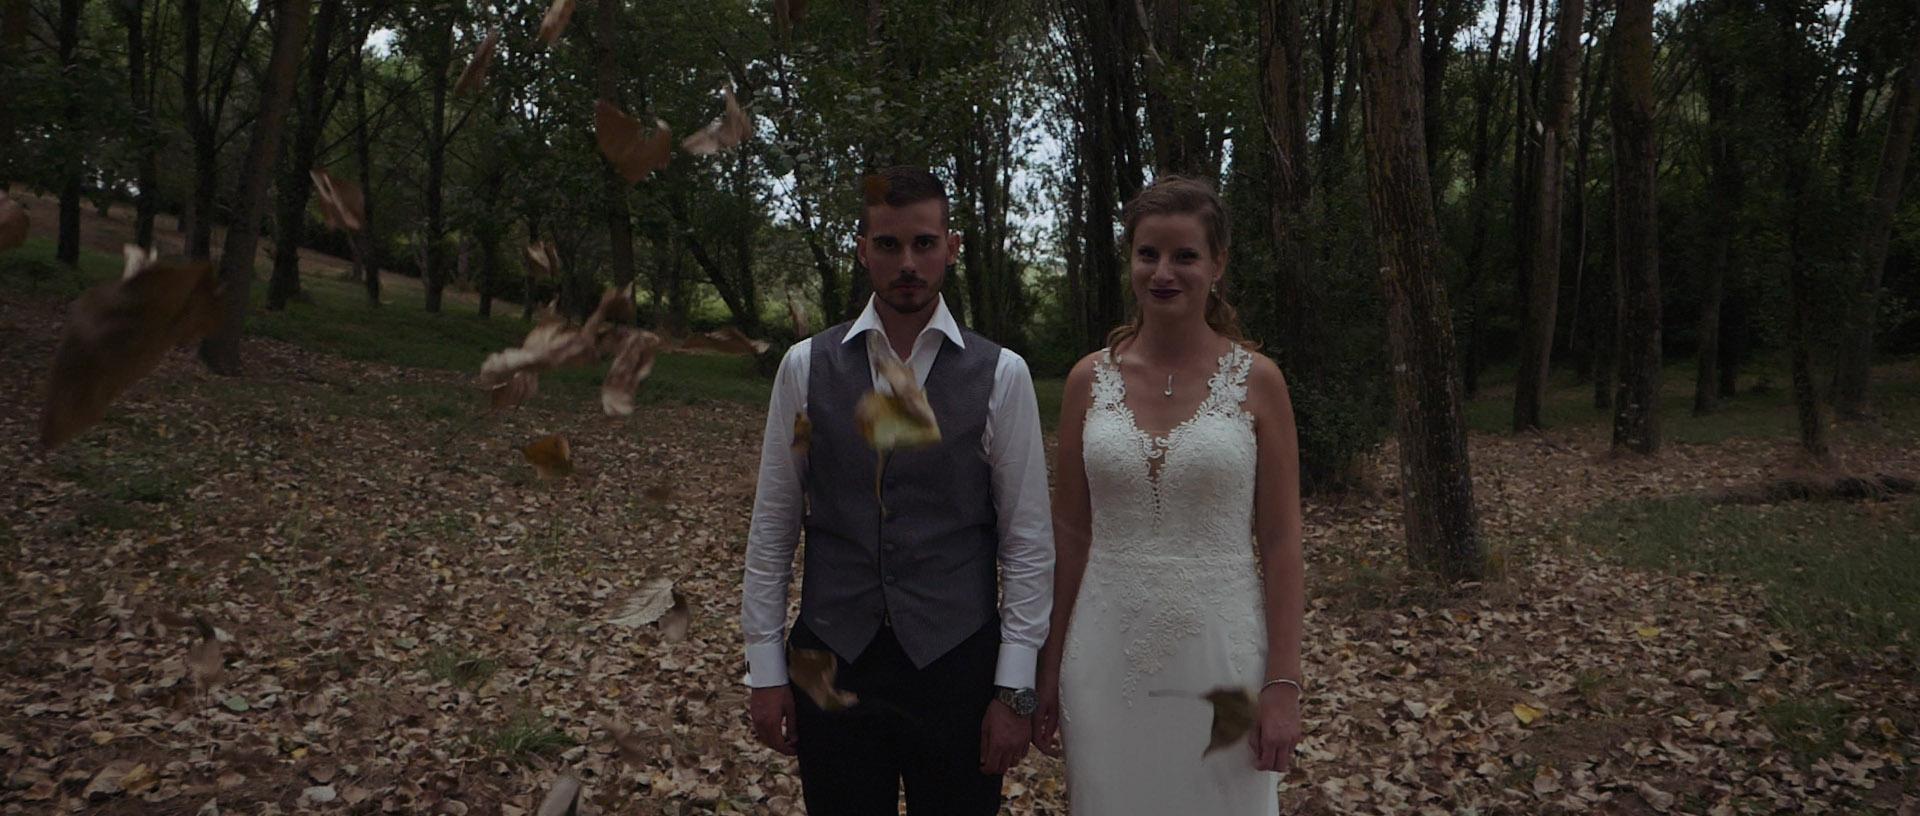 Flávia & Miguel - Wedding